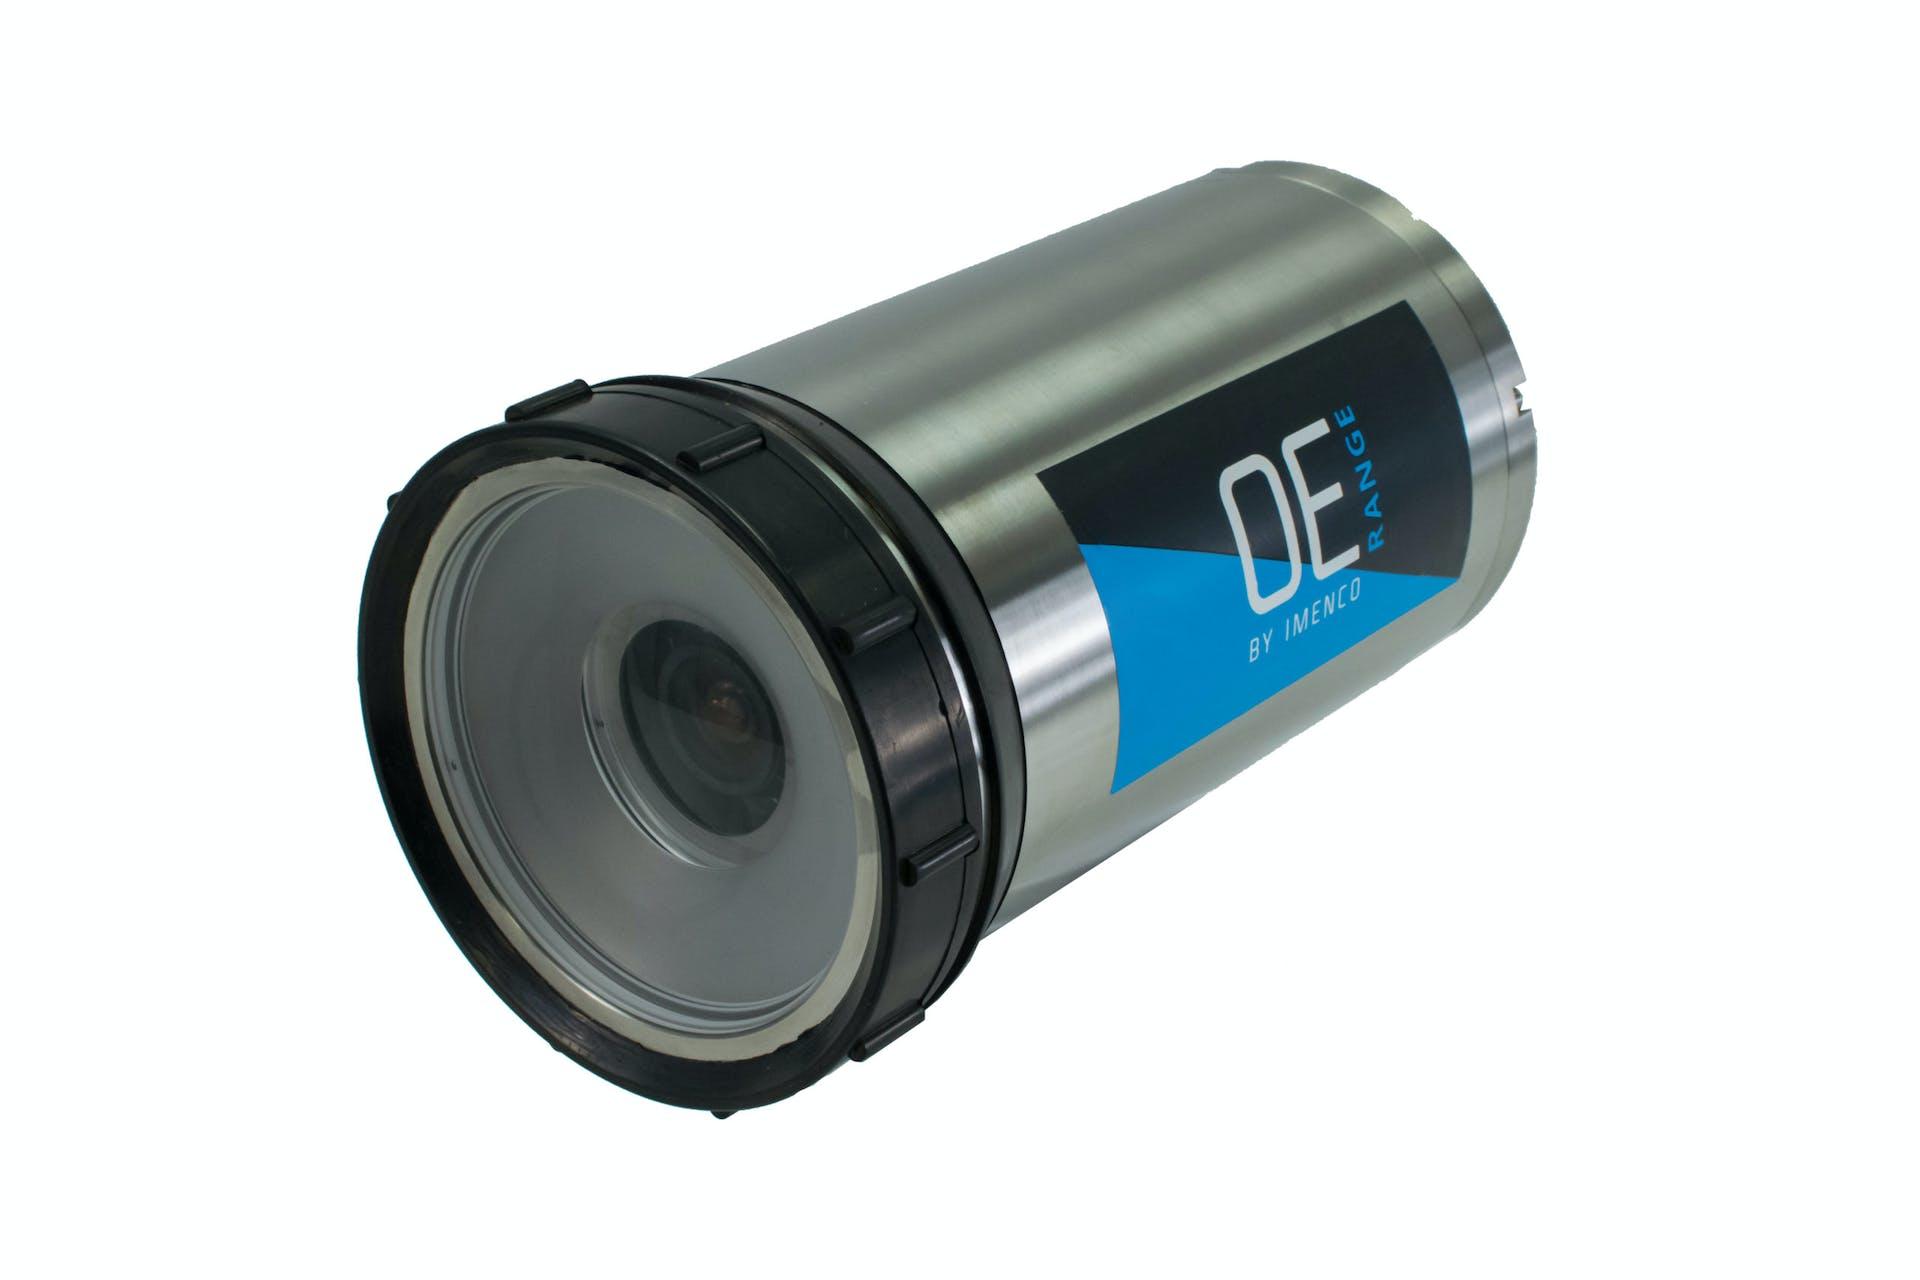 OE13-124125 Low Light Underwater Navigation Camera